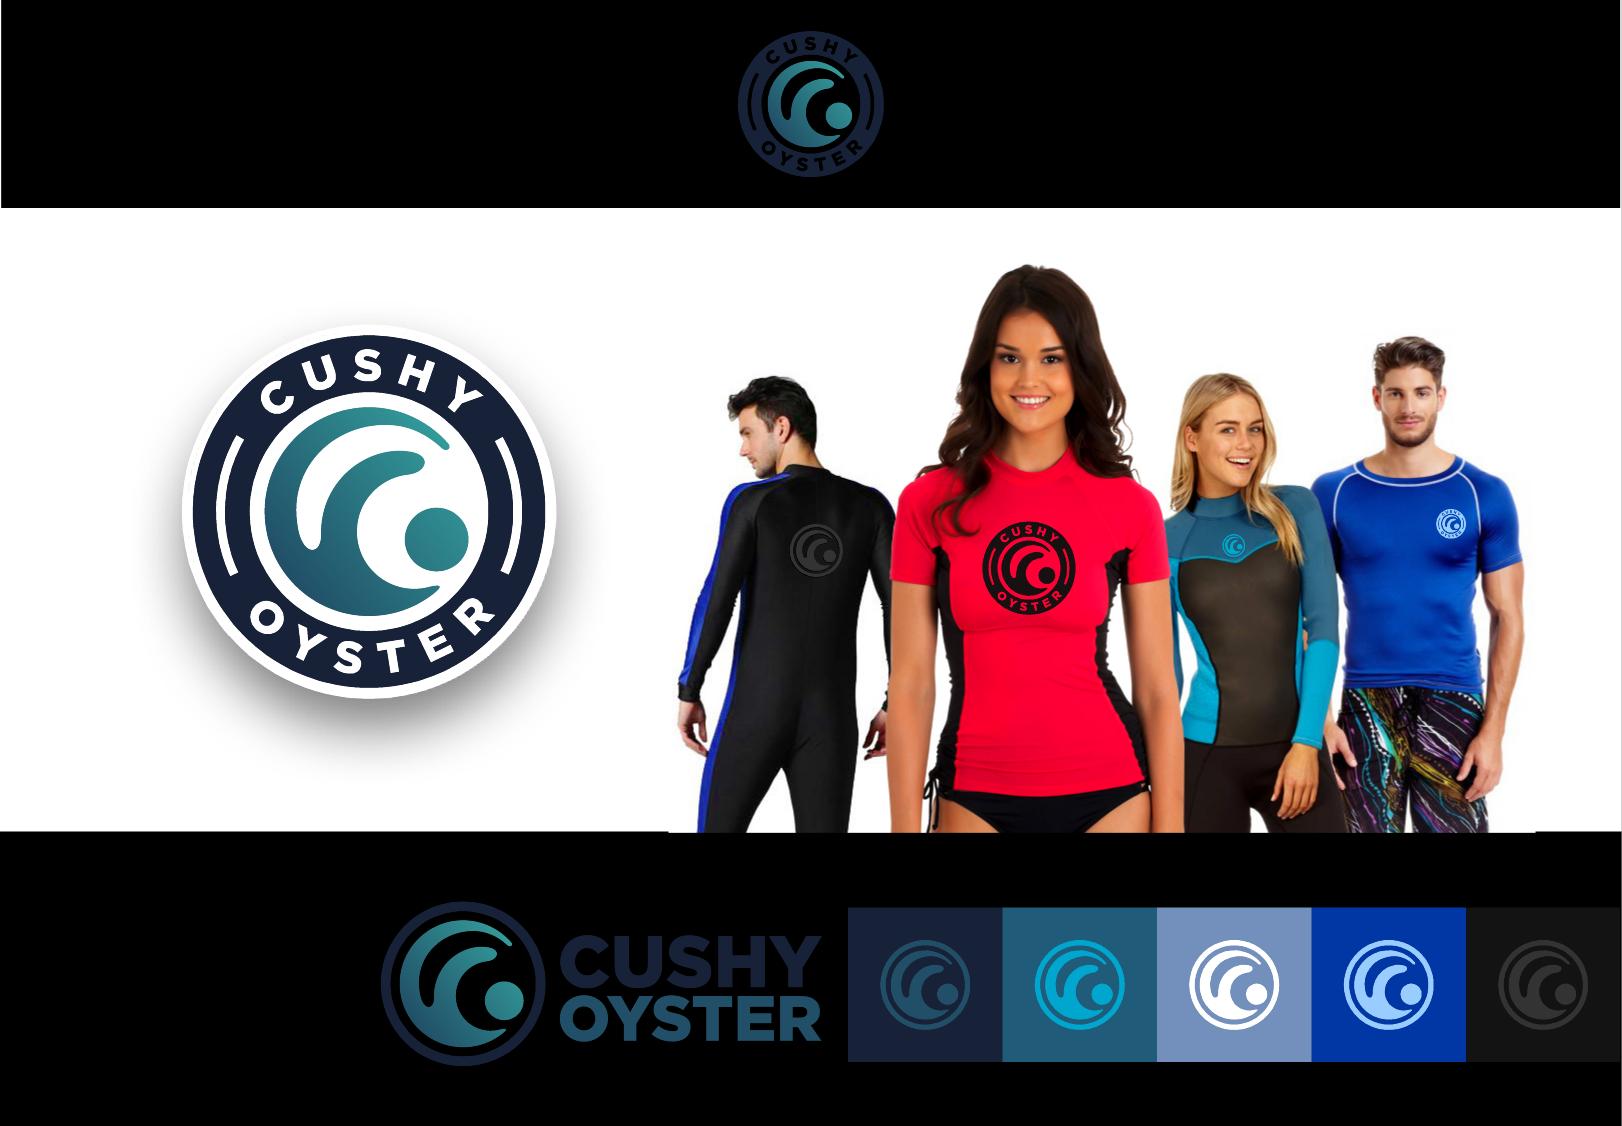 Start-up company - Cushy Oyster (Cushy O) wants you!